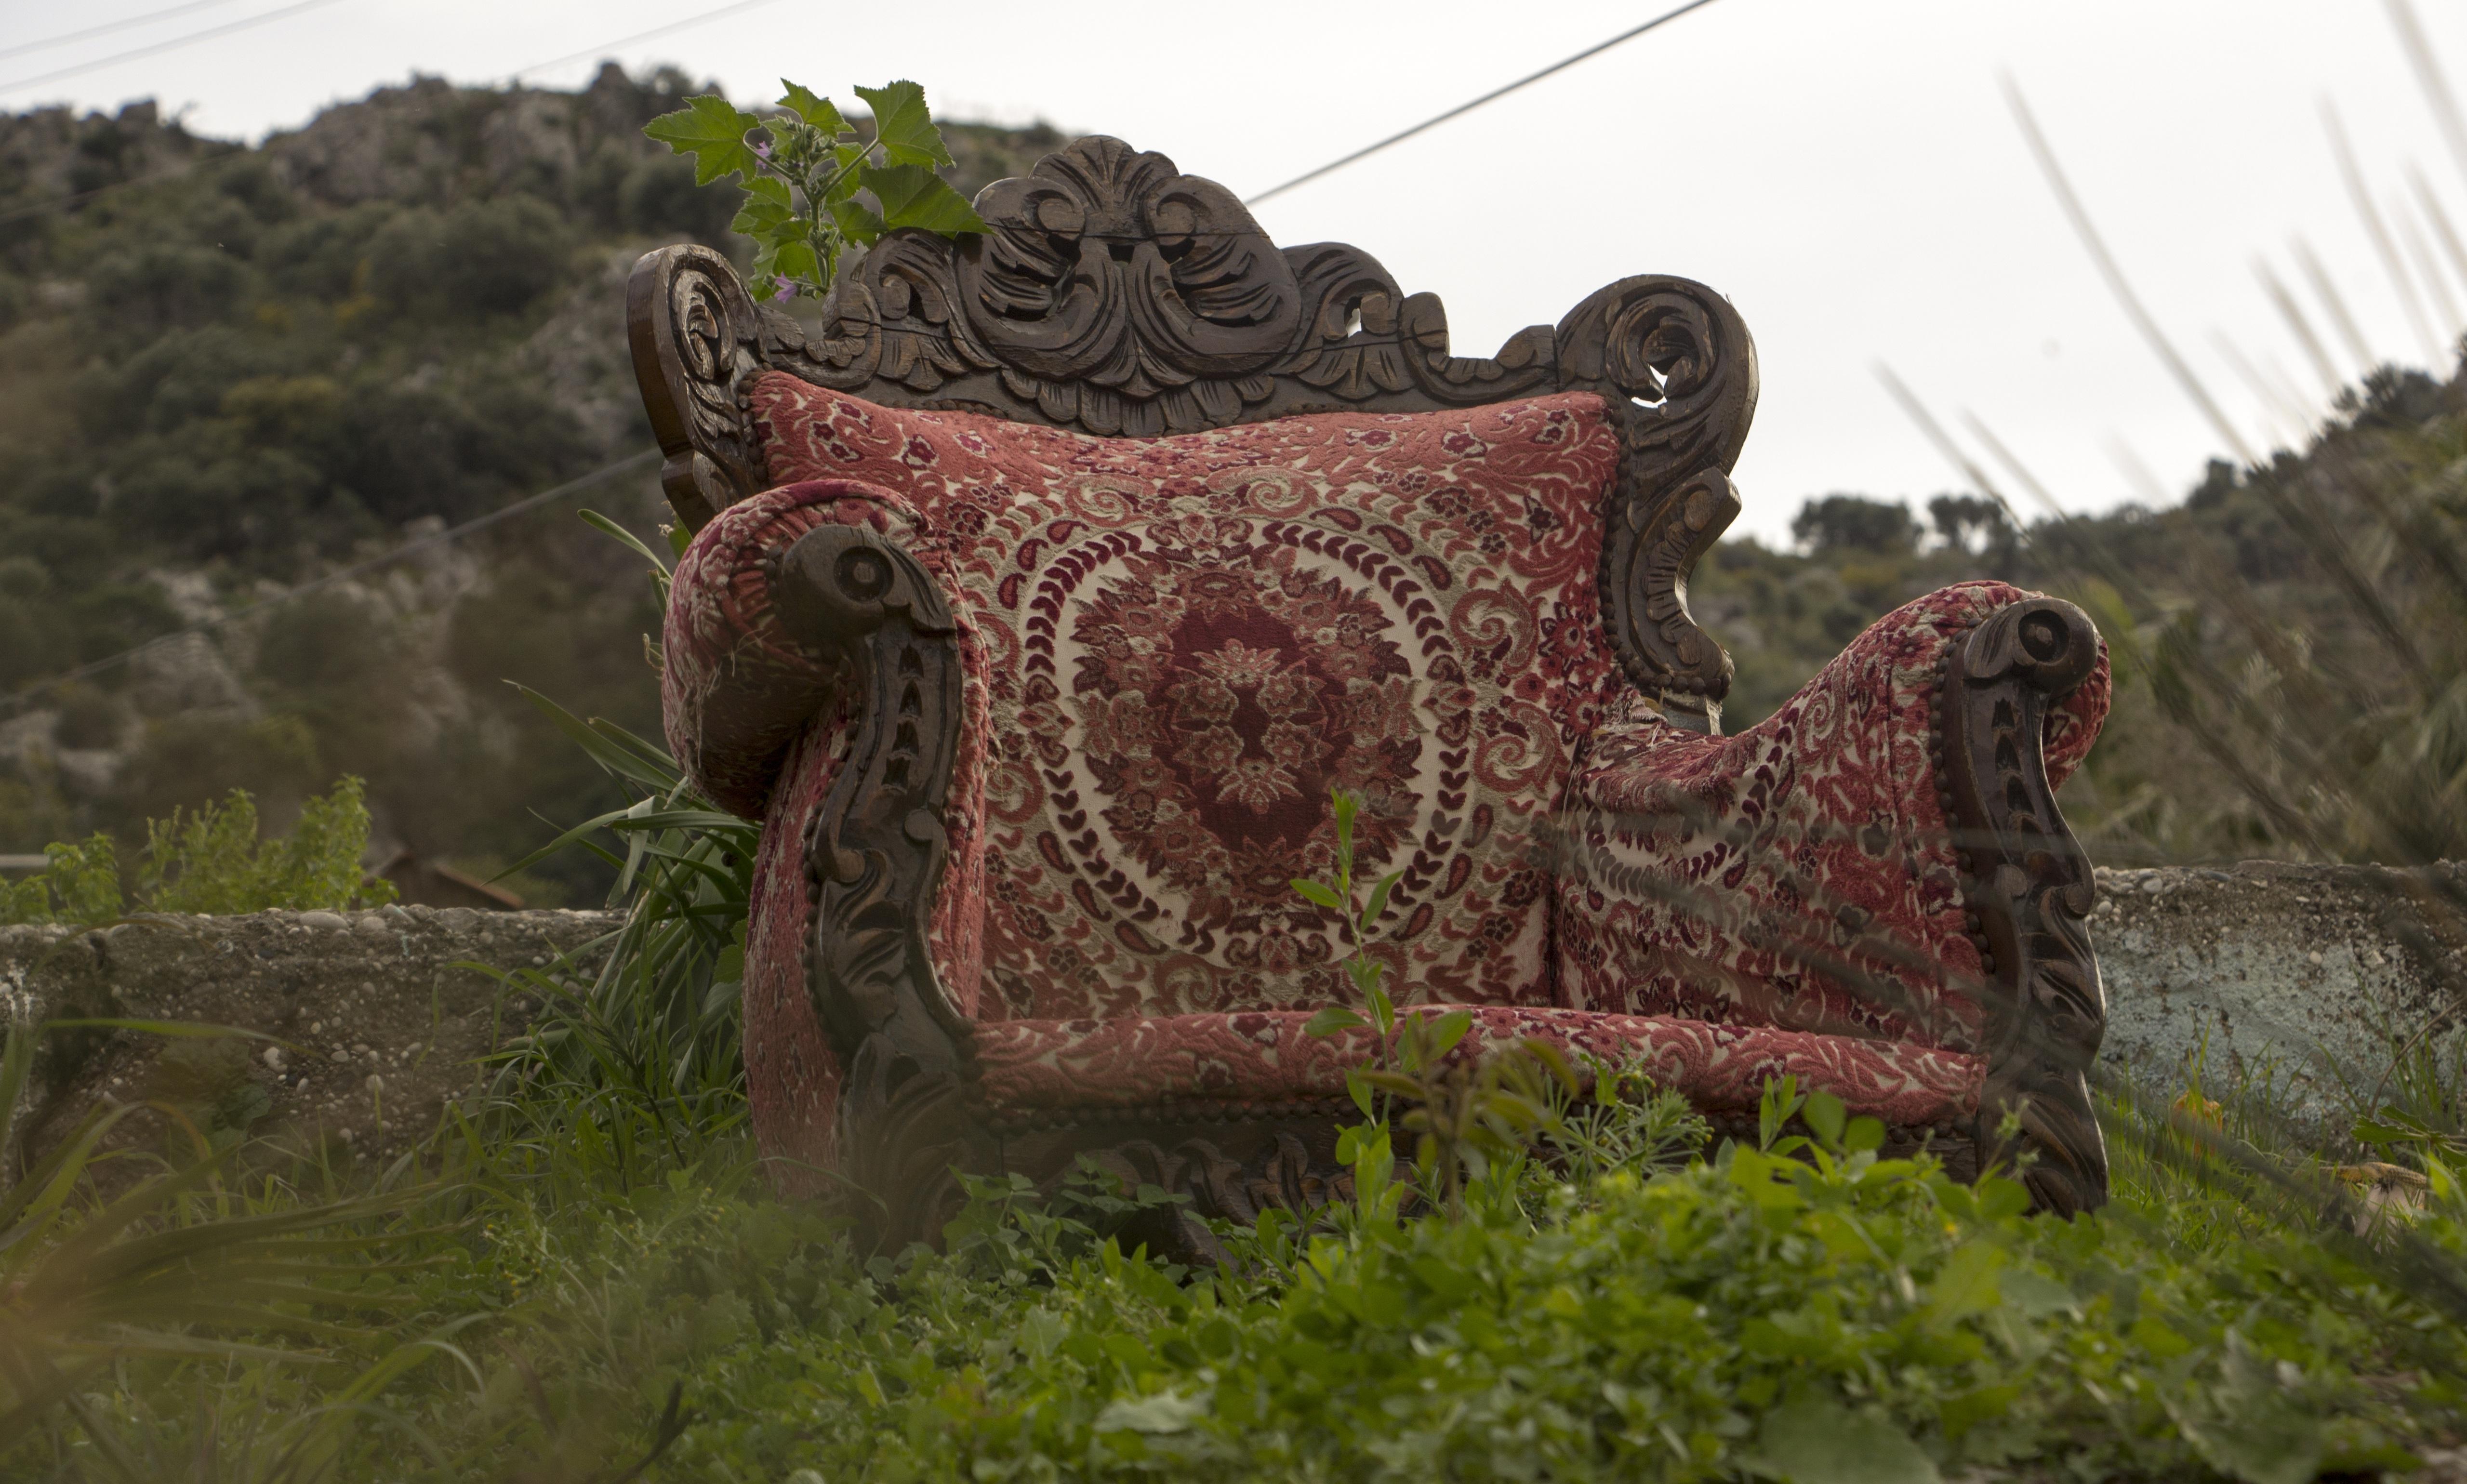 Fotos Gratis Retro Silla Antiguo Viajar Verde Selva  # Muebles Nauticos Antiguos